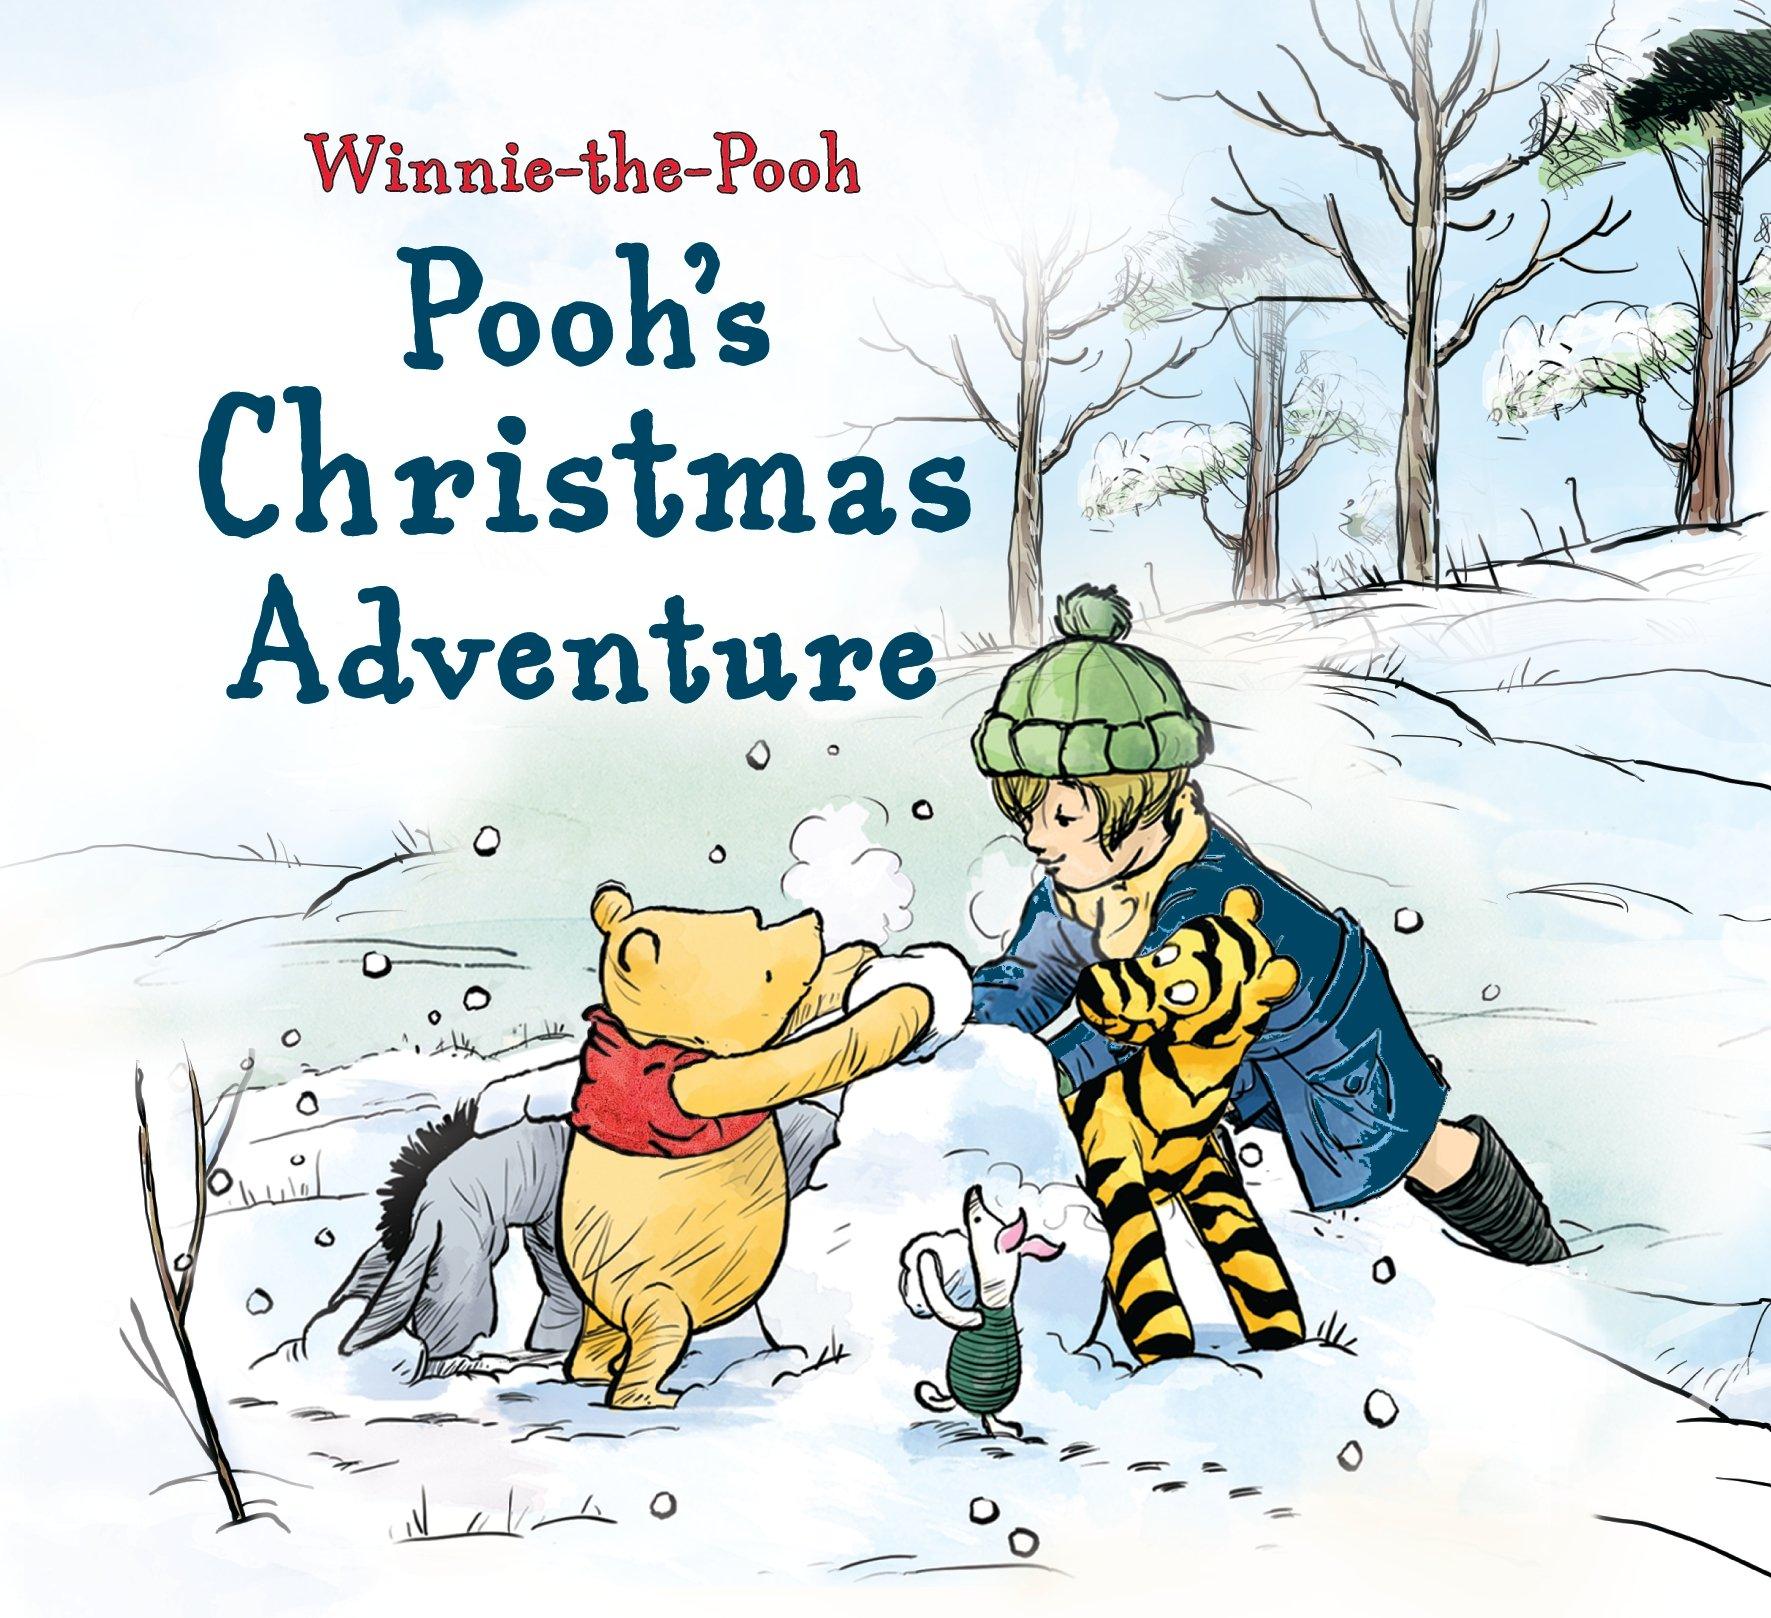 Winnie The Pooh Christmas.Winnie The Pooh Pooh S Christmas Adventure Andrew Grey